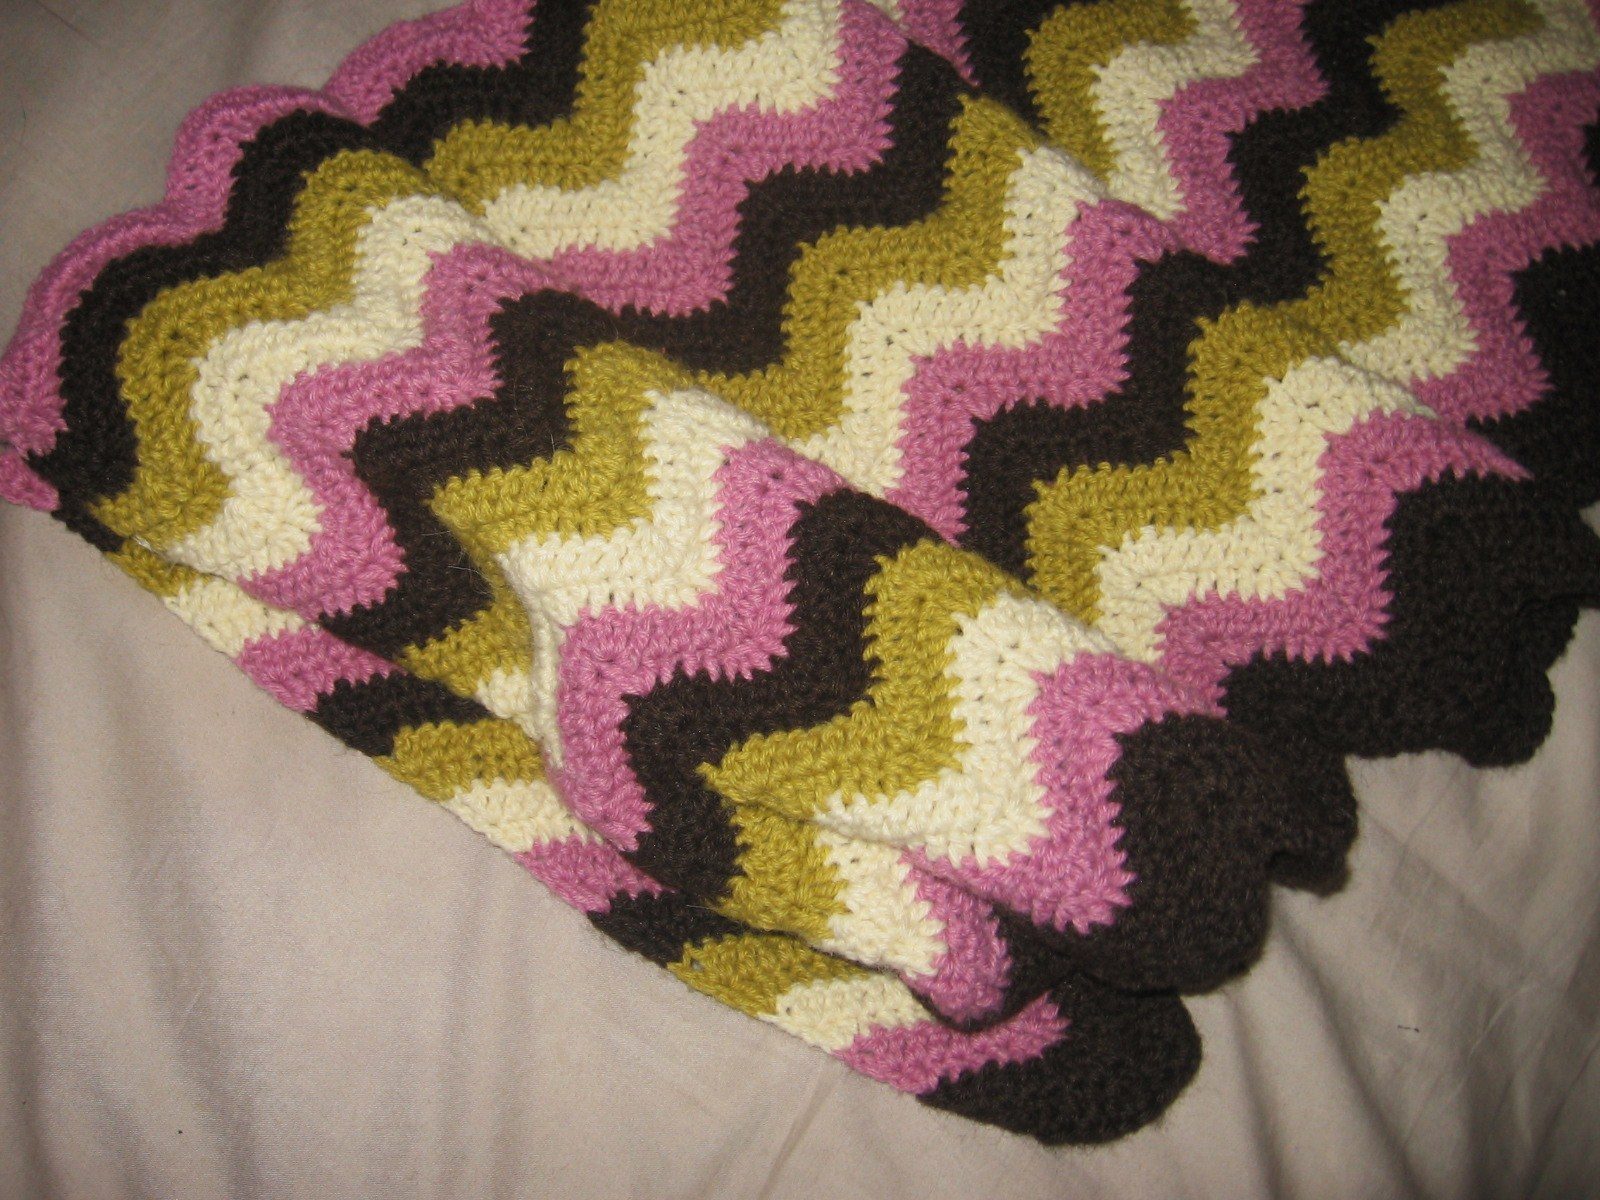 Taller de Crochet Claudia Solari: Manta o piesera a rayas zig-zag ...